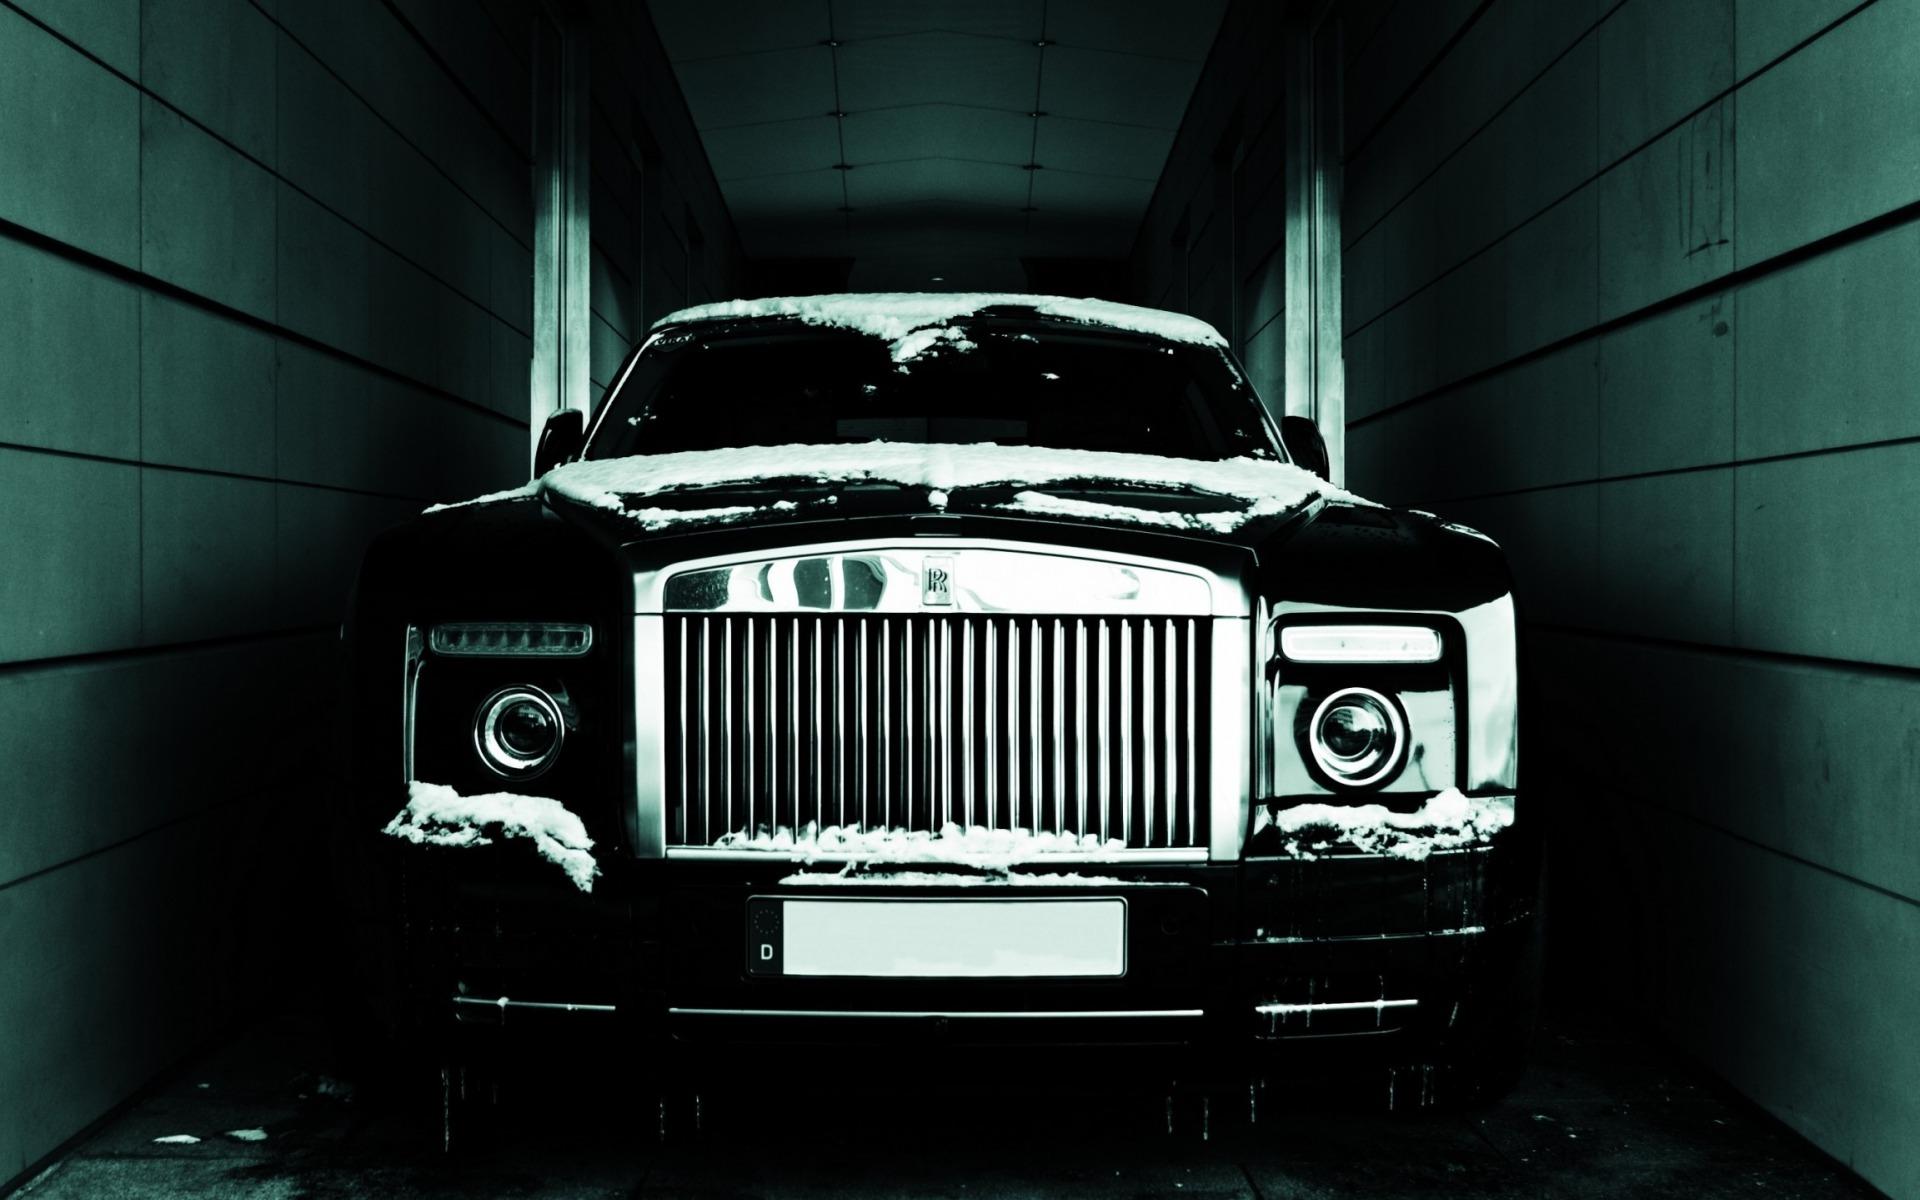 Rolls Royce Phantom Full HD Wallpaper And Background Image